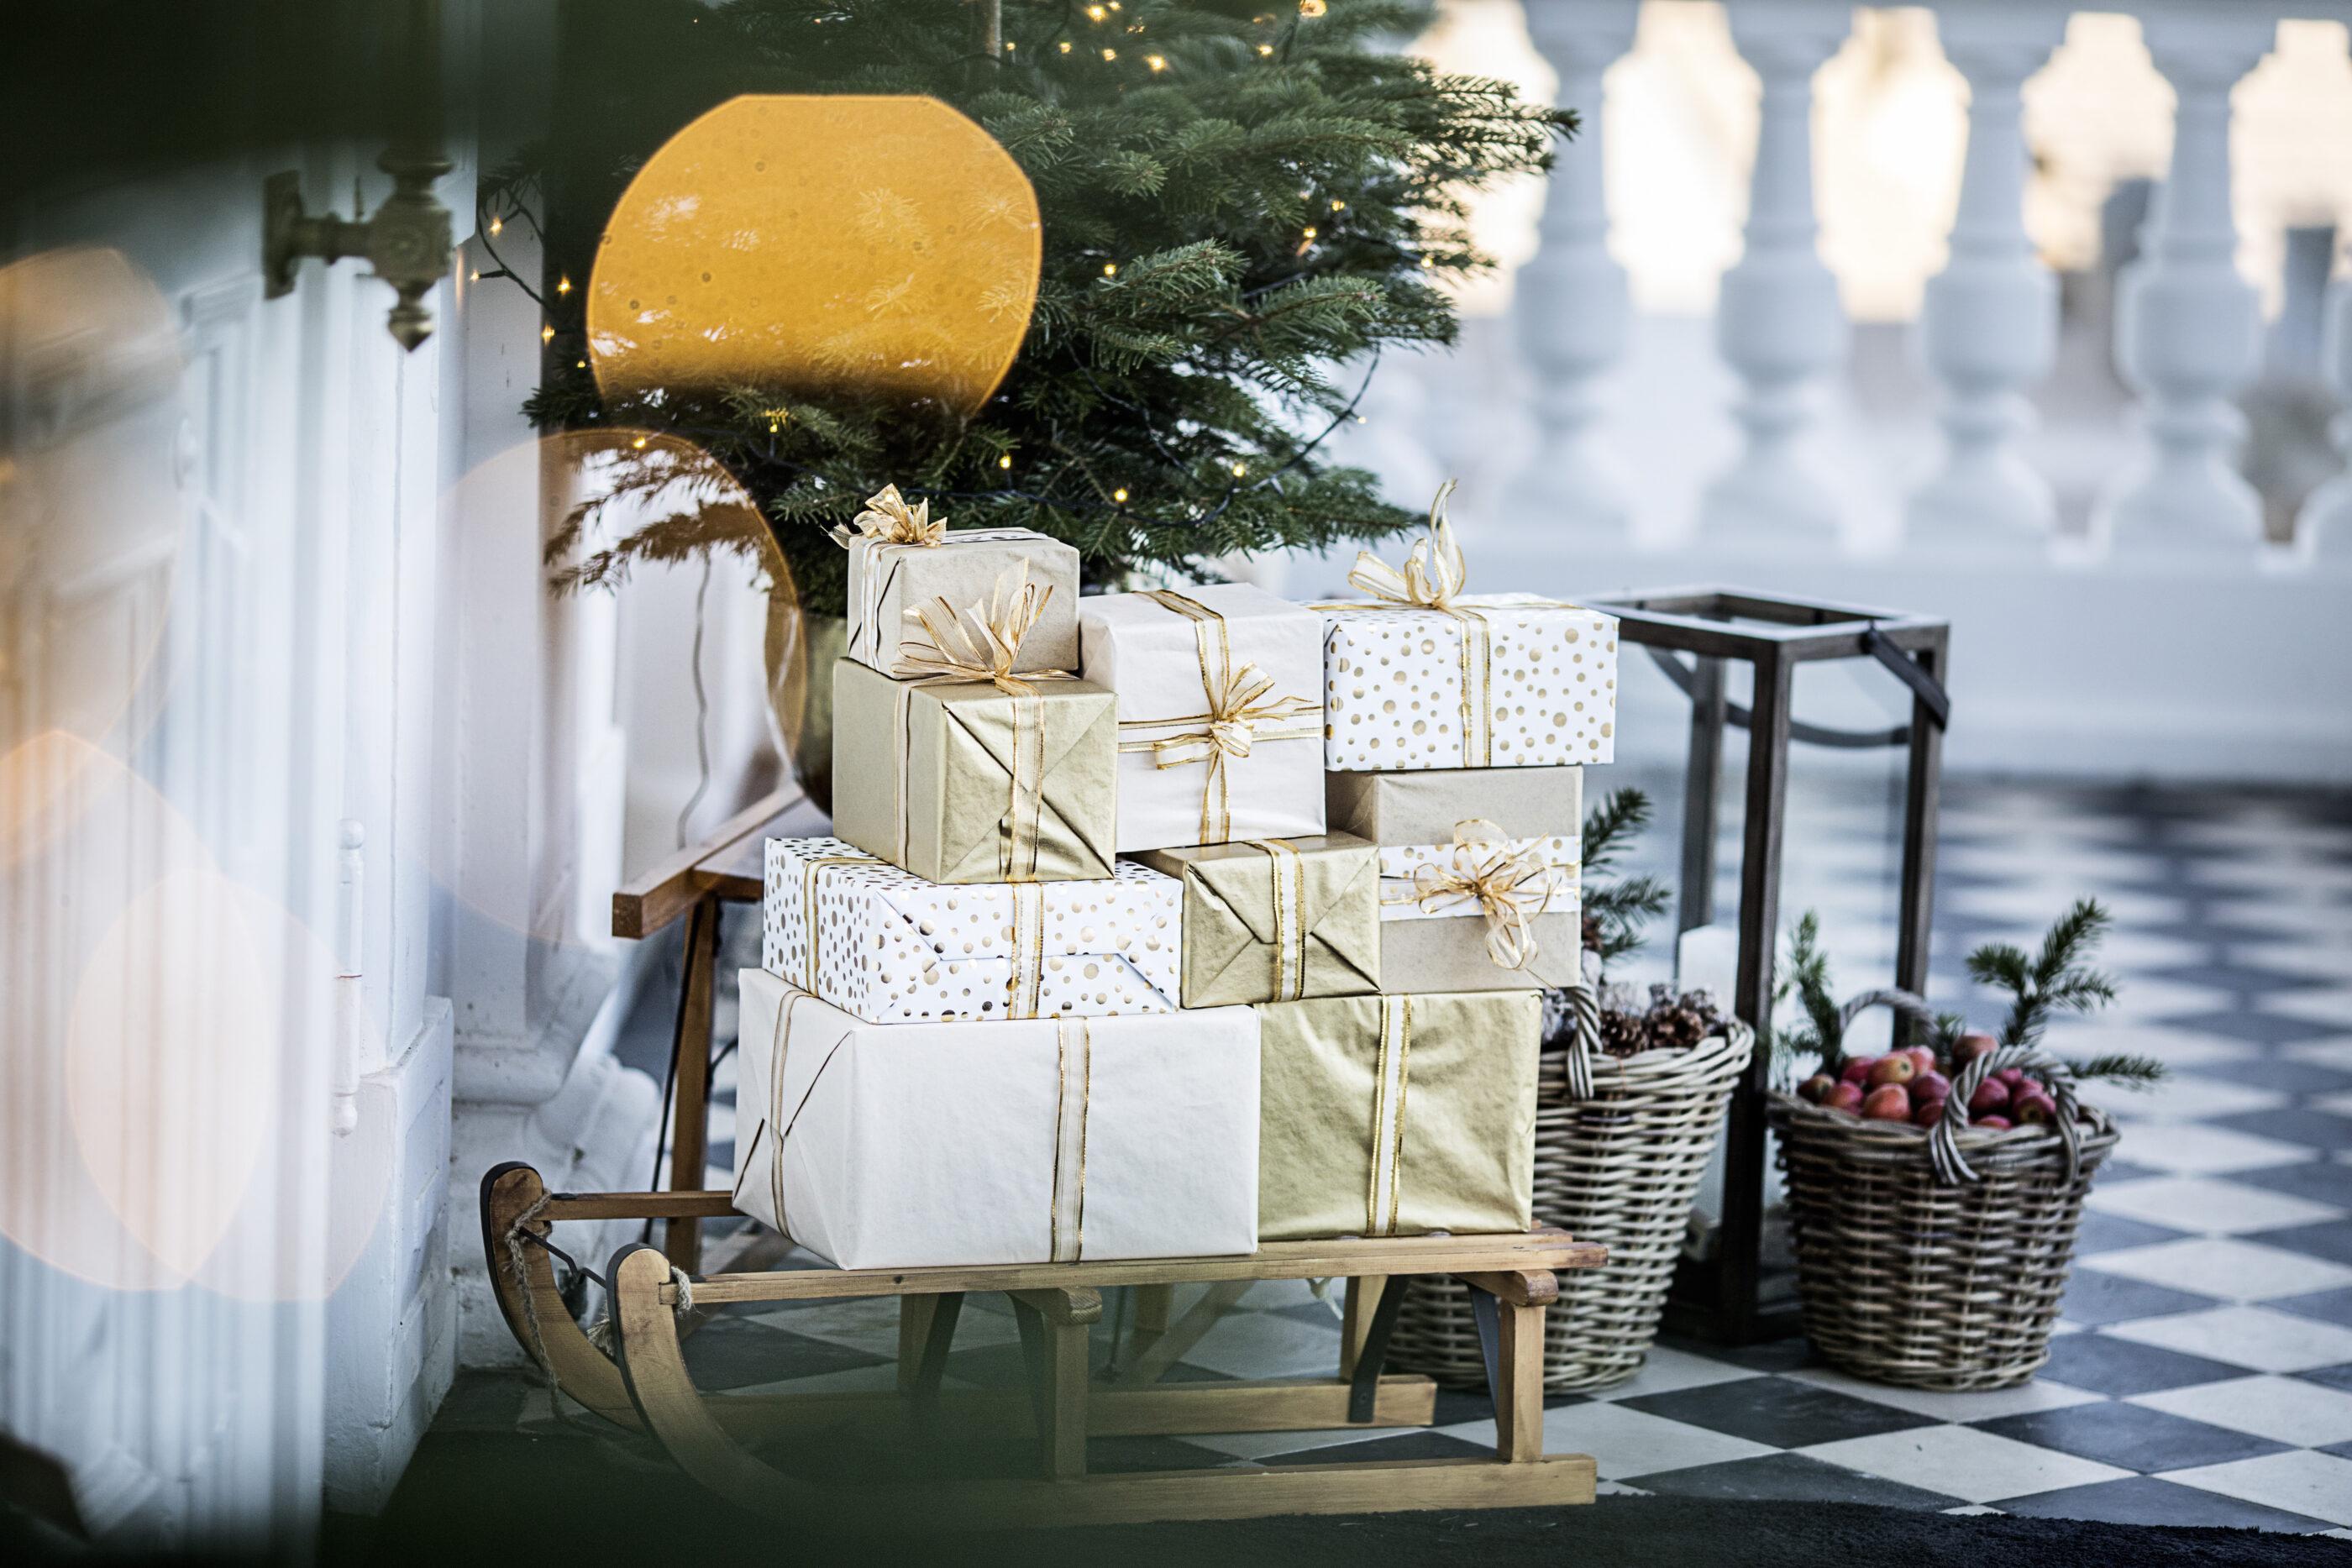 En masse julegaver ligger ovenpå en gammeldags slæde